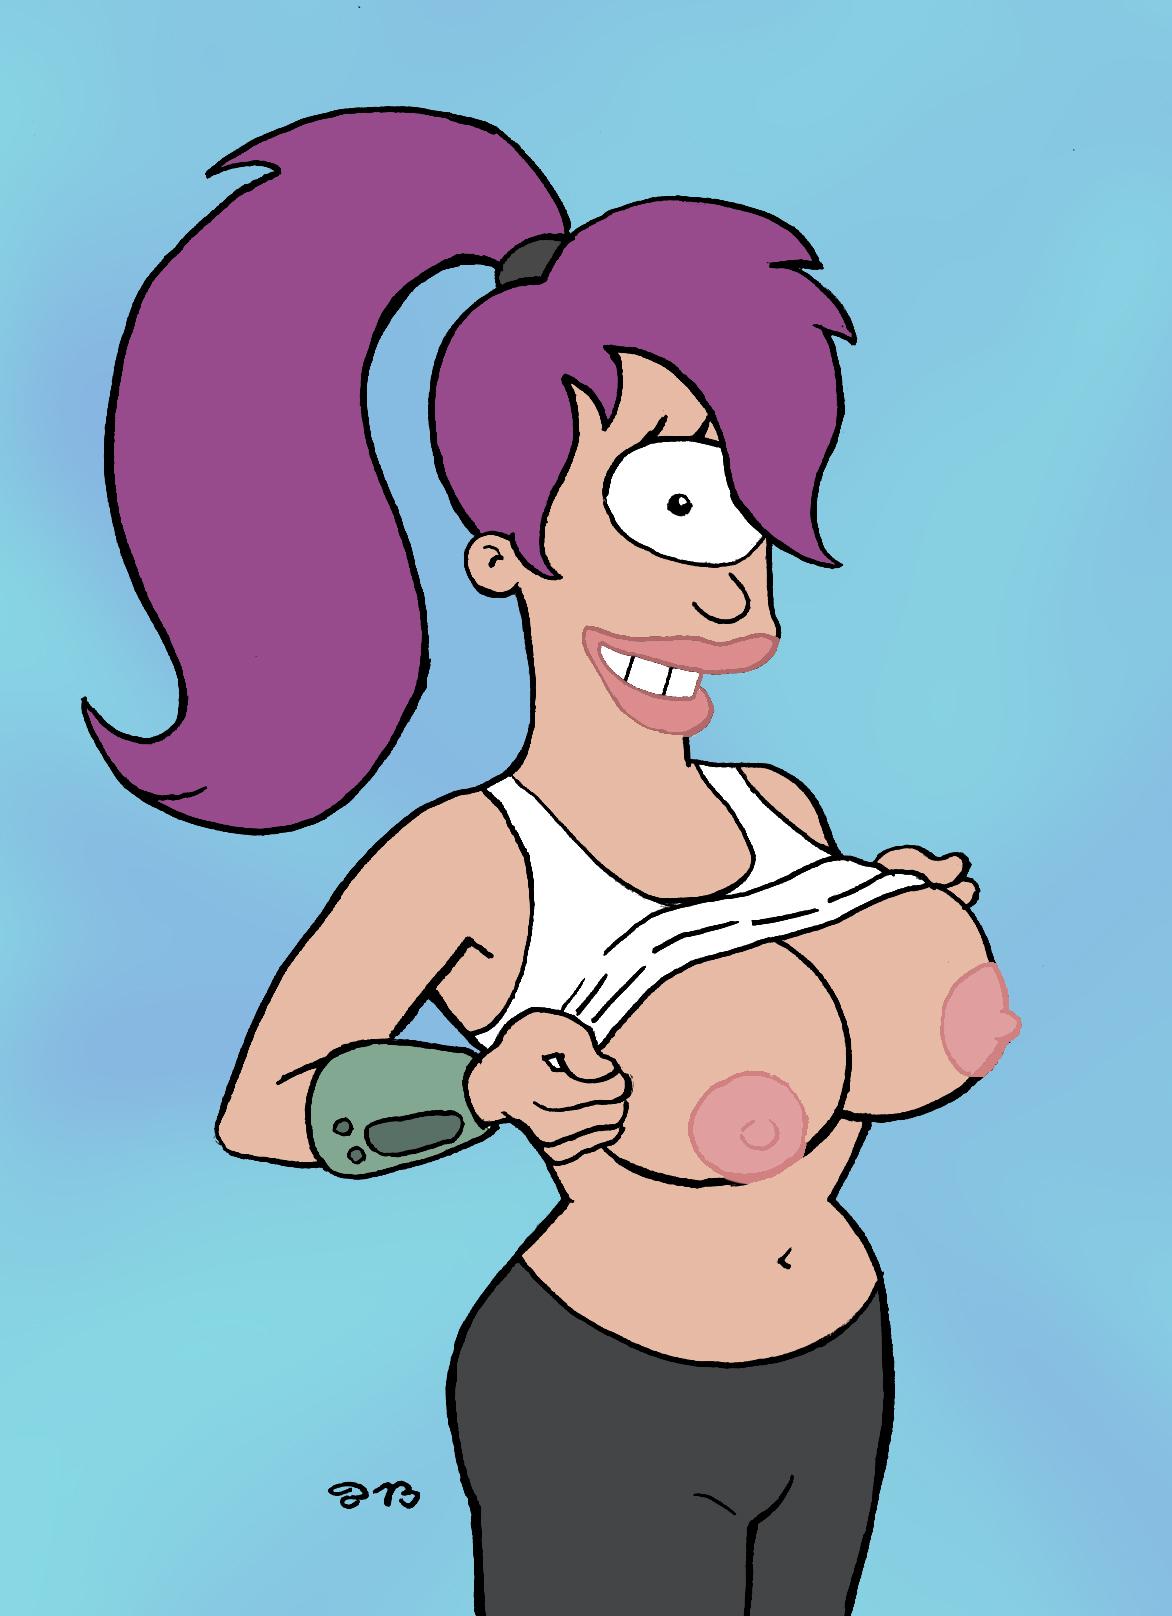 Futurama professor and mom porn